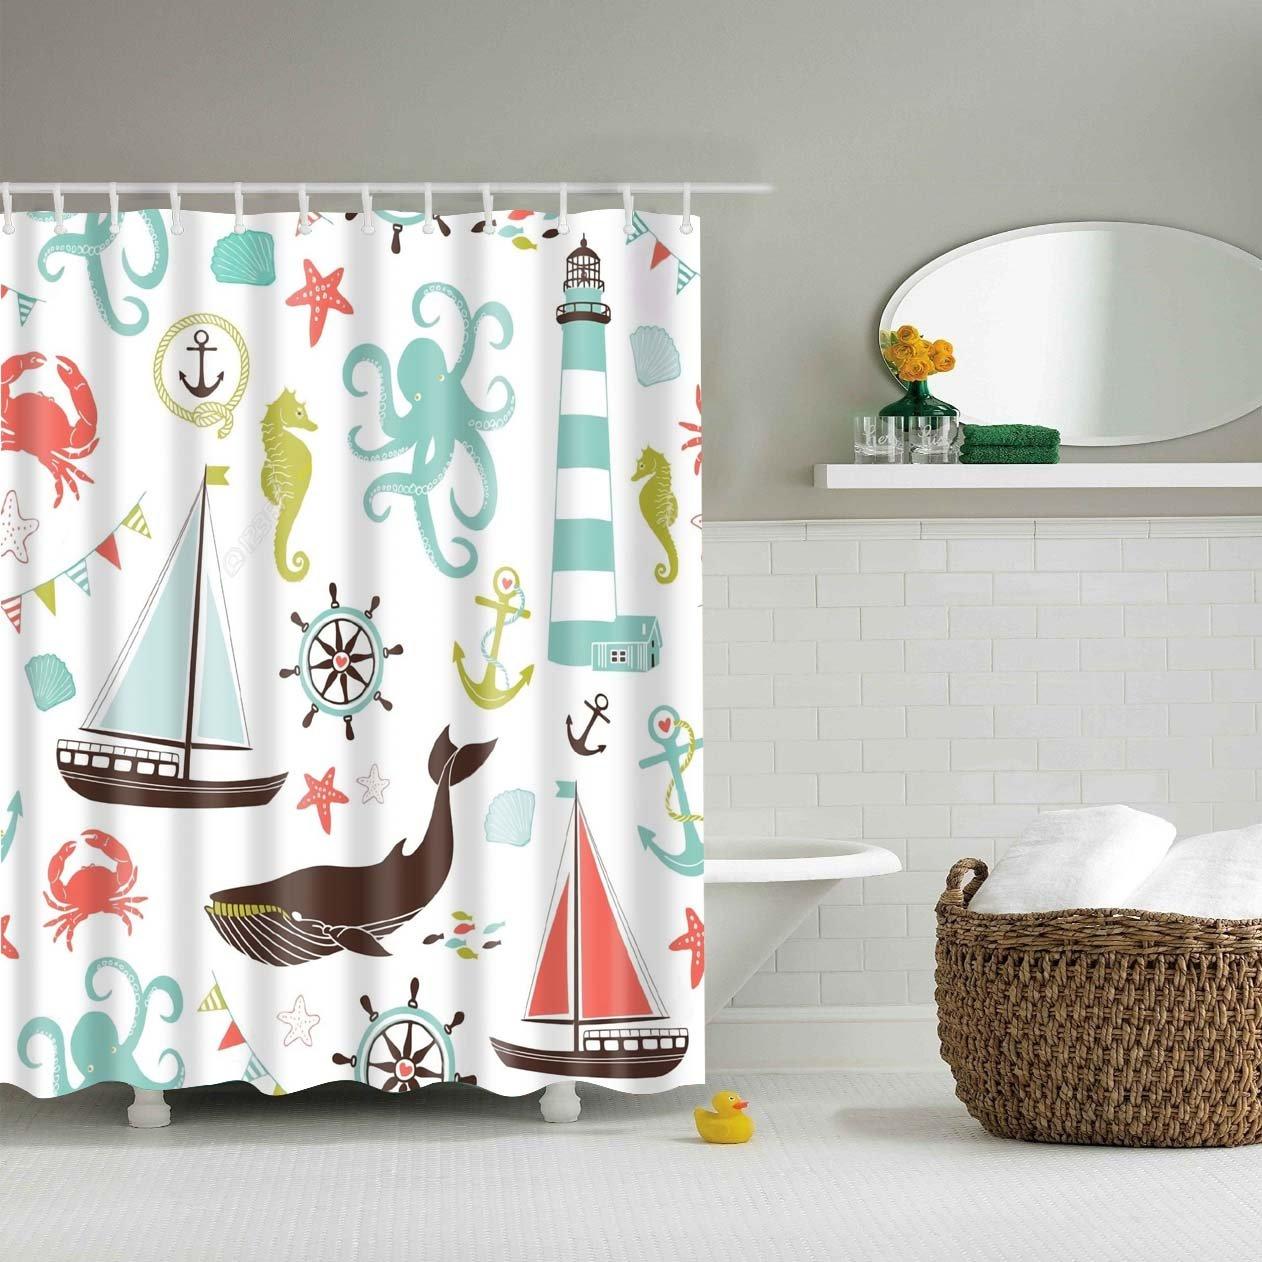 Ocean Themed Unisex Kids Shower Curtain Bathroom Decor Kids Shower Curtain Kid Bathroom Decor Bathroom Themes